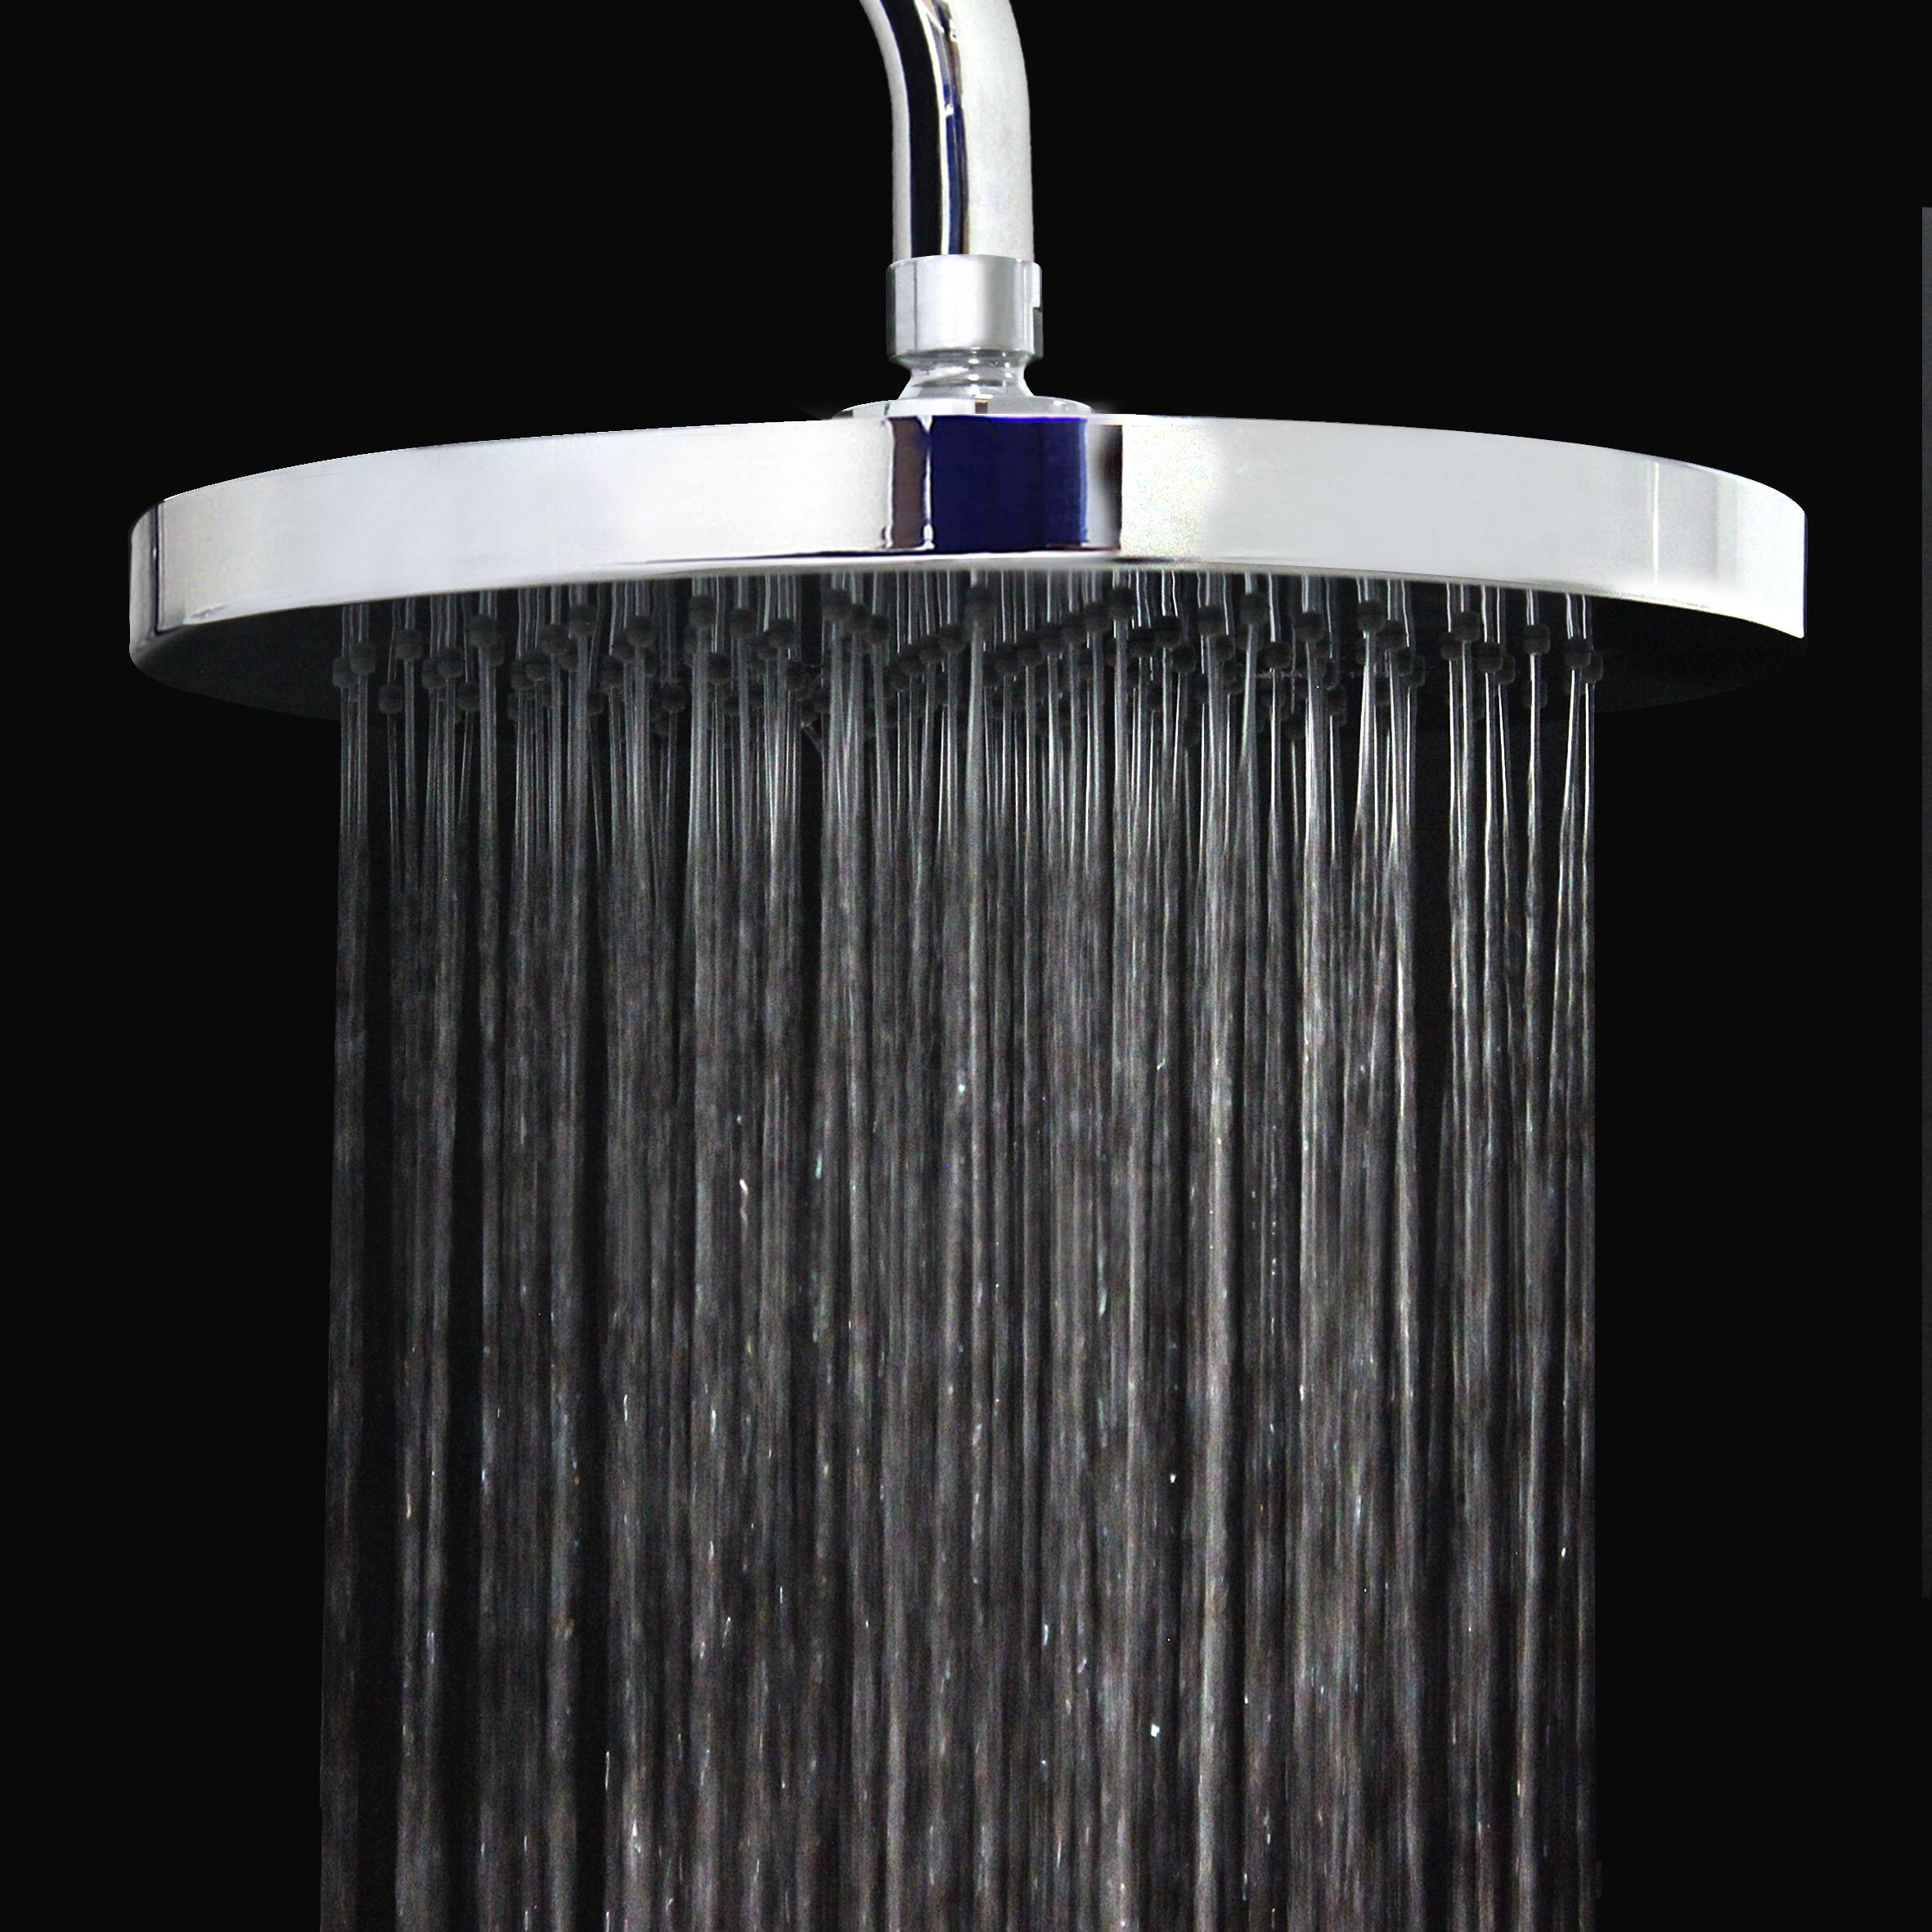 Modona long arm 2 5 gpm rain shower head wayfair - Glass shower head ...